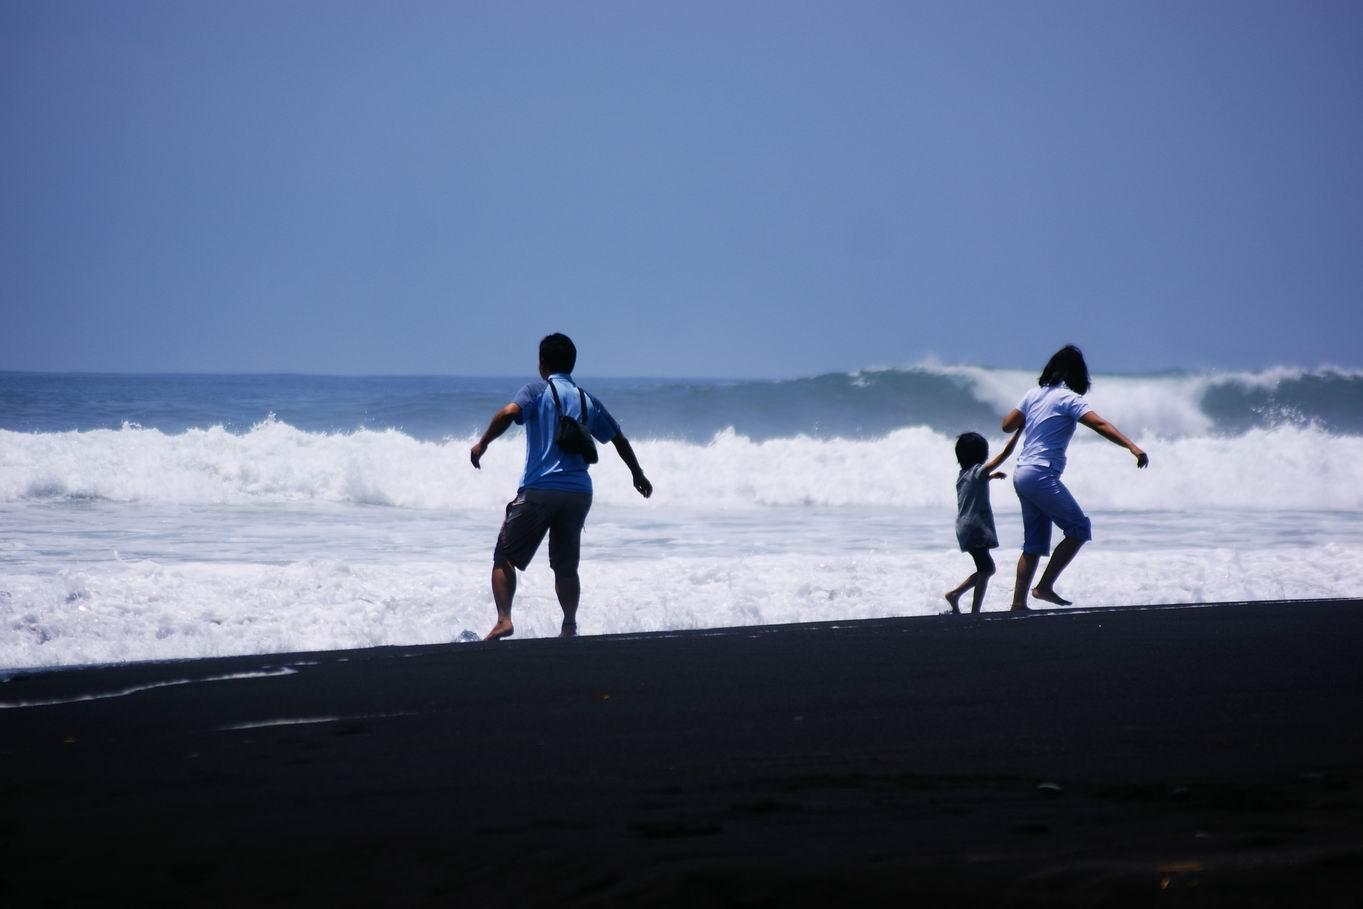 Tempat Wisata Lumajang Menarik Kunjungi Pantai Bambang Matainginbicara Wordpress Kab